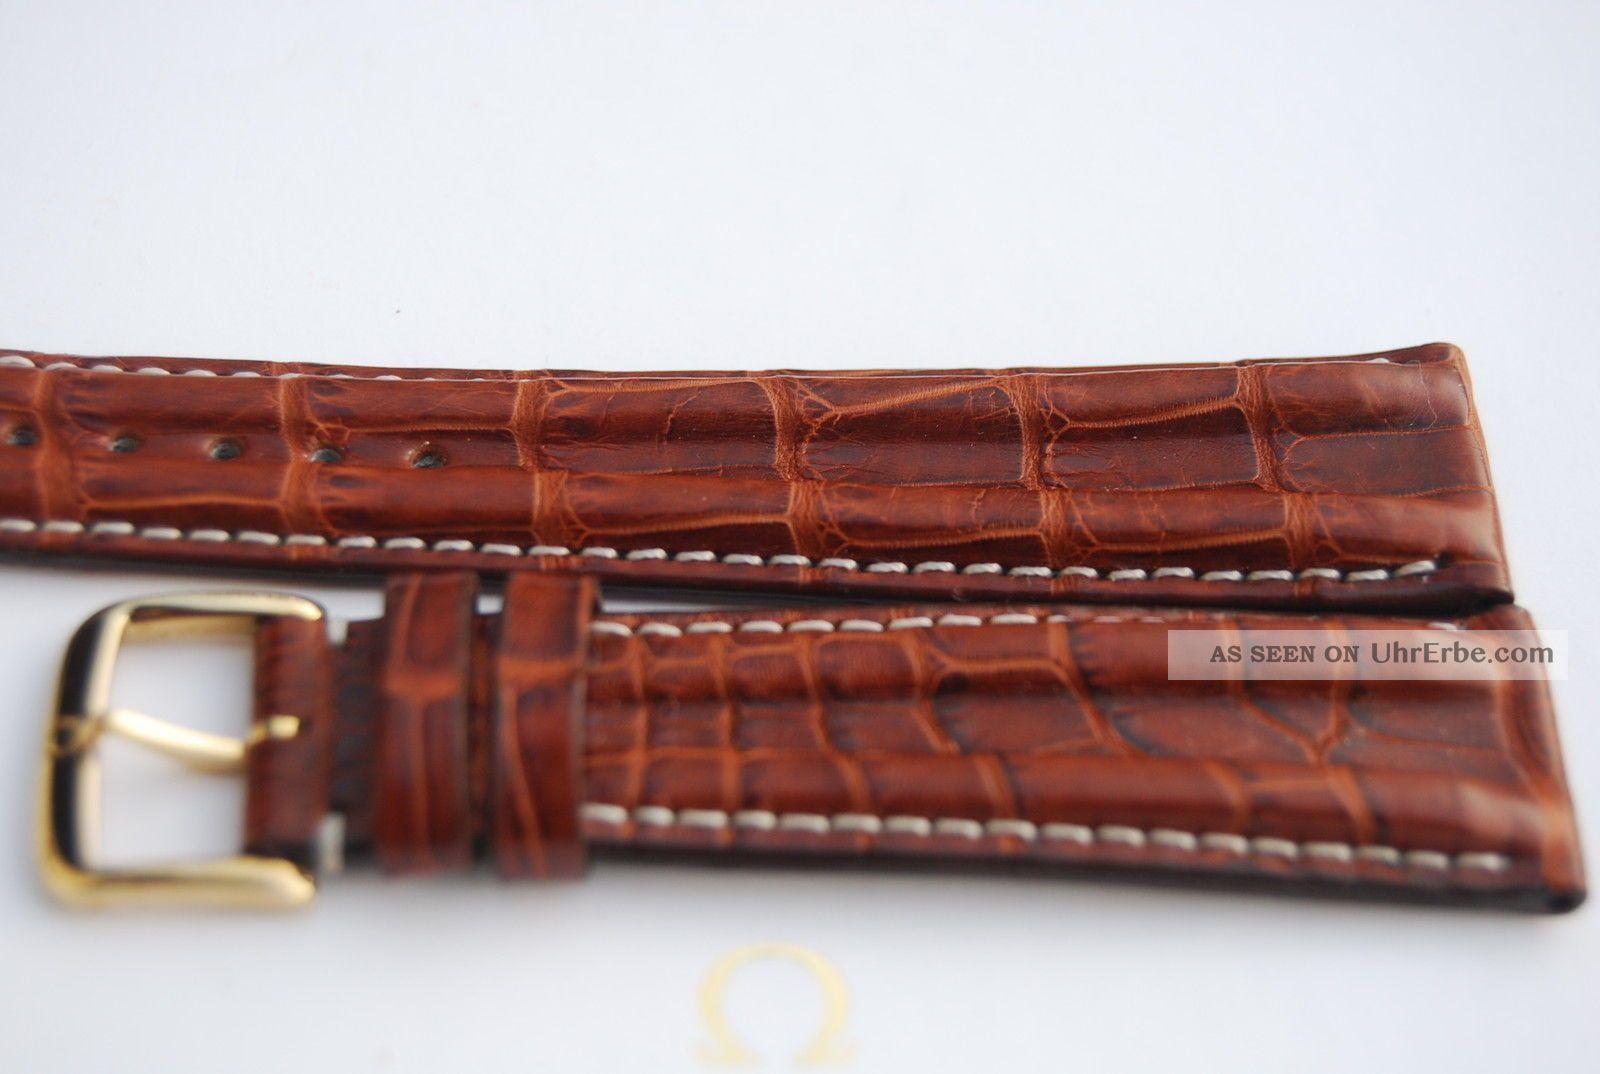 Omega Kroko - Lederband/braun Krokodil 20mm Armband/bracelet Leder 4 Armbanduhren Bild